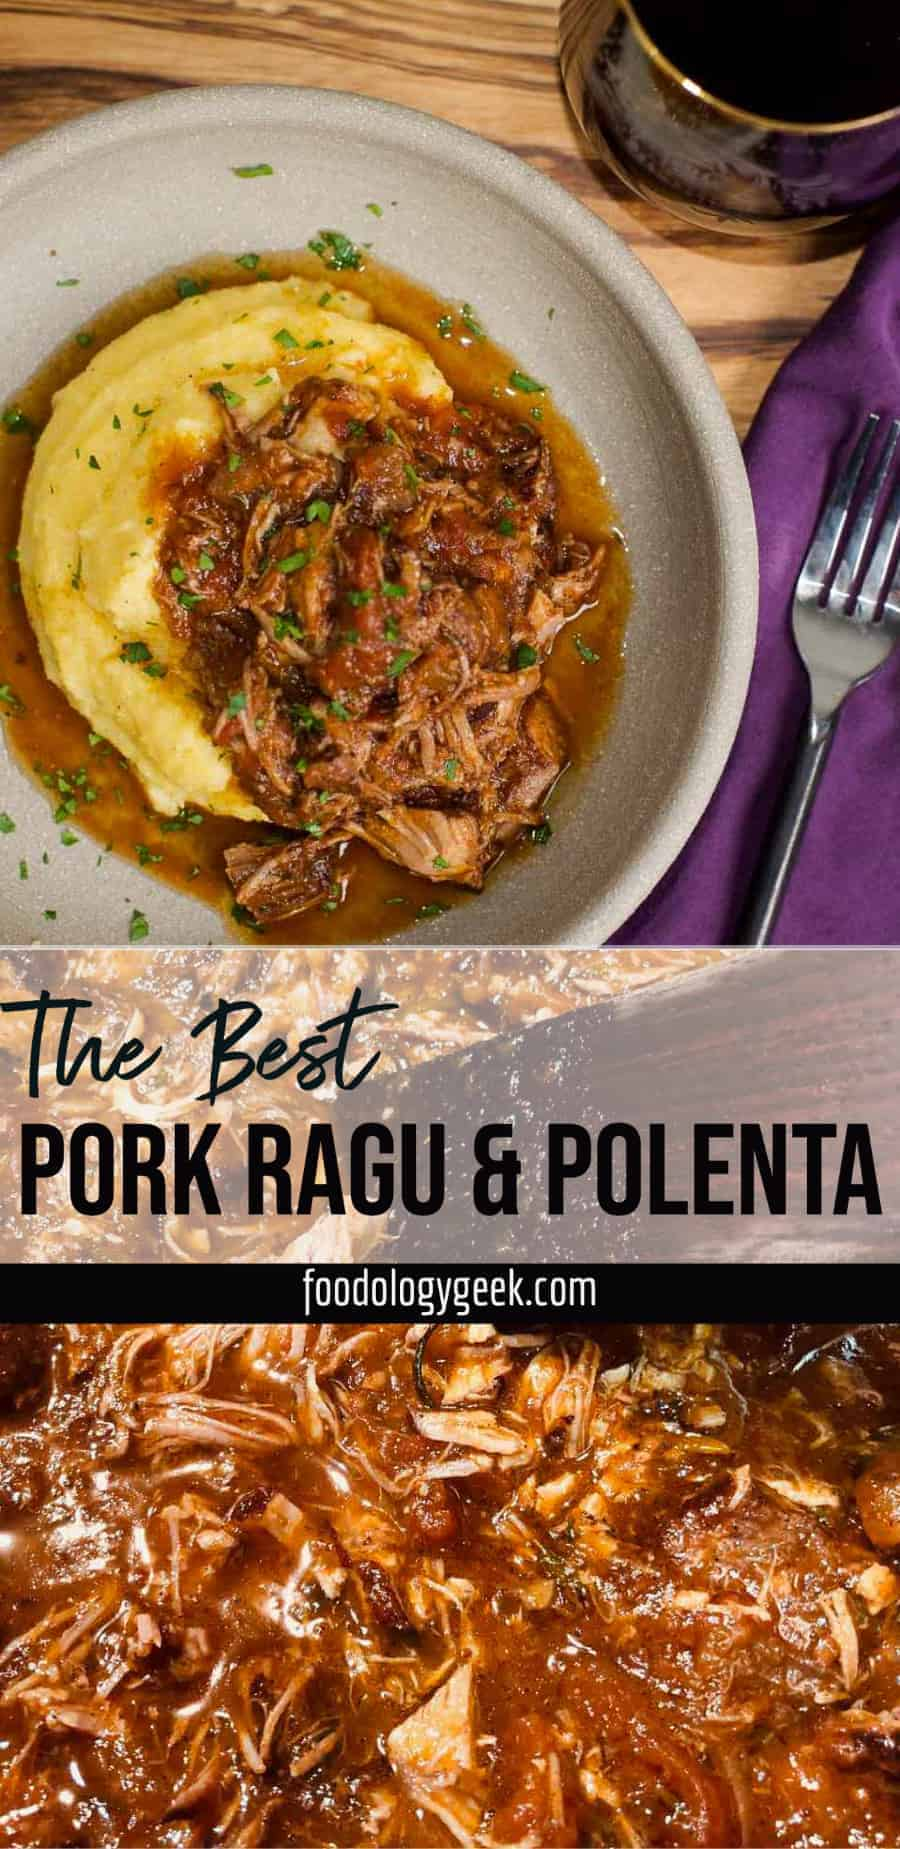 the best pork ragu and creamy polenta pinterest pin by foodology geek